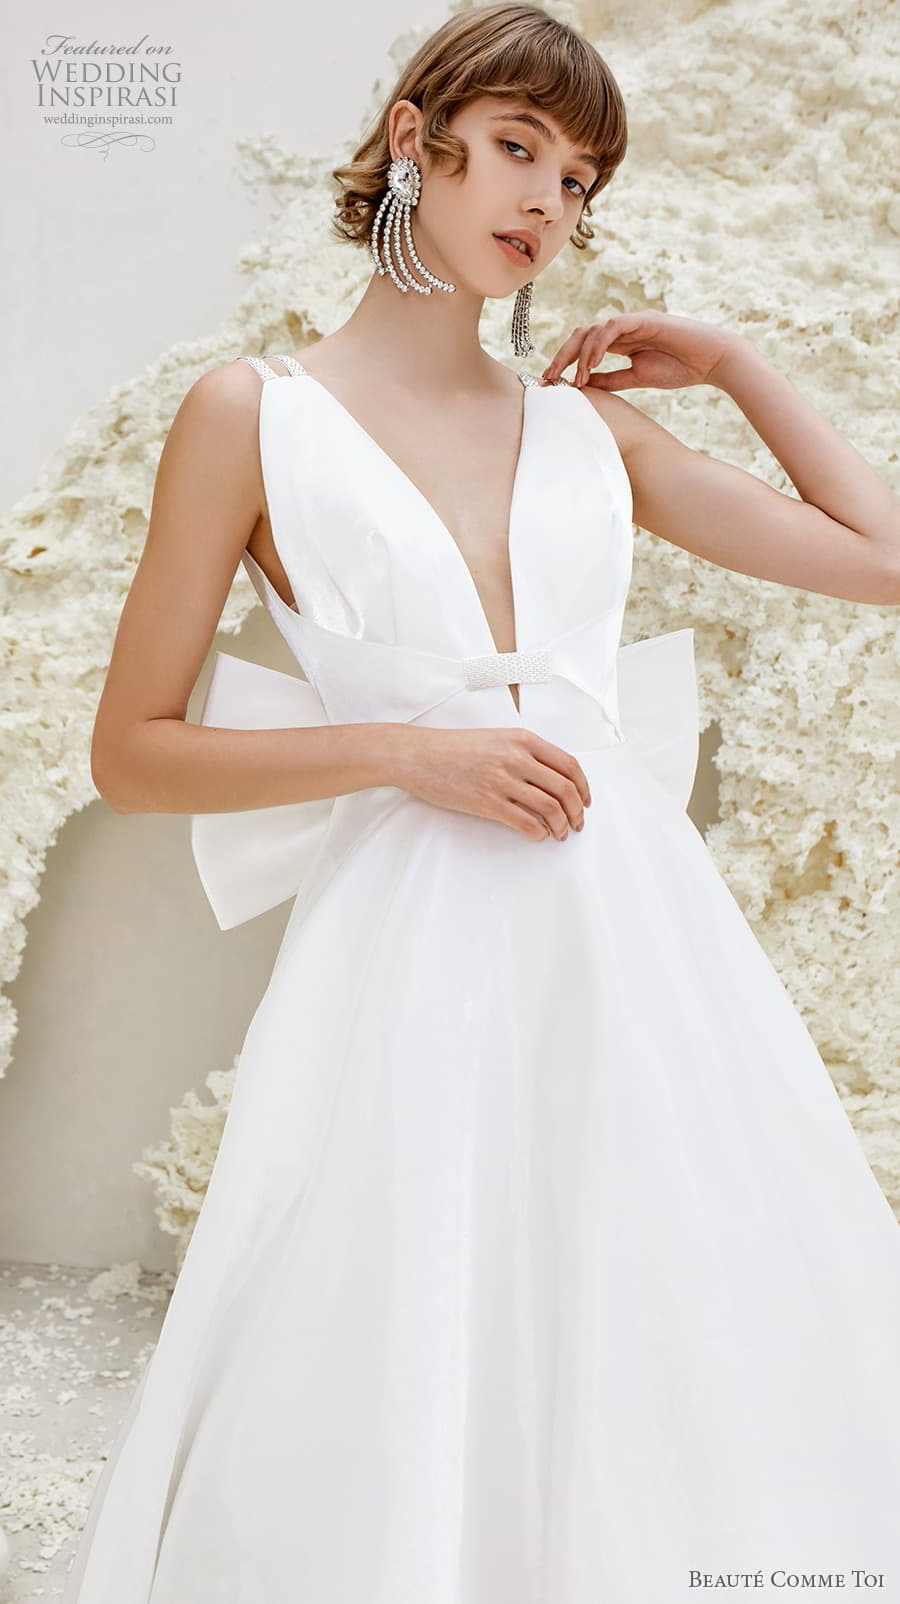 beaute comme toi spring 2022 bridal double strap deep v neckline simple minimalist modern chic a line wedding dress low ribbon back chapel train (phyllis) zv